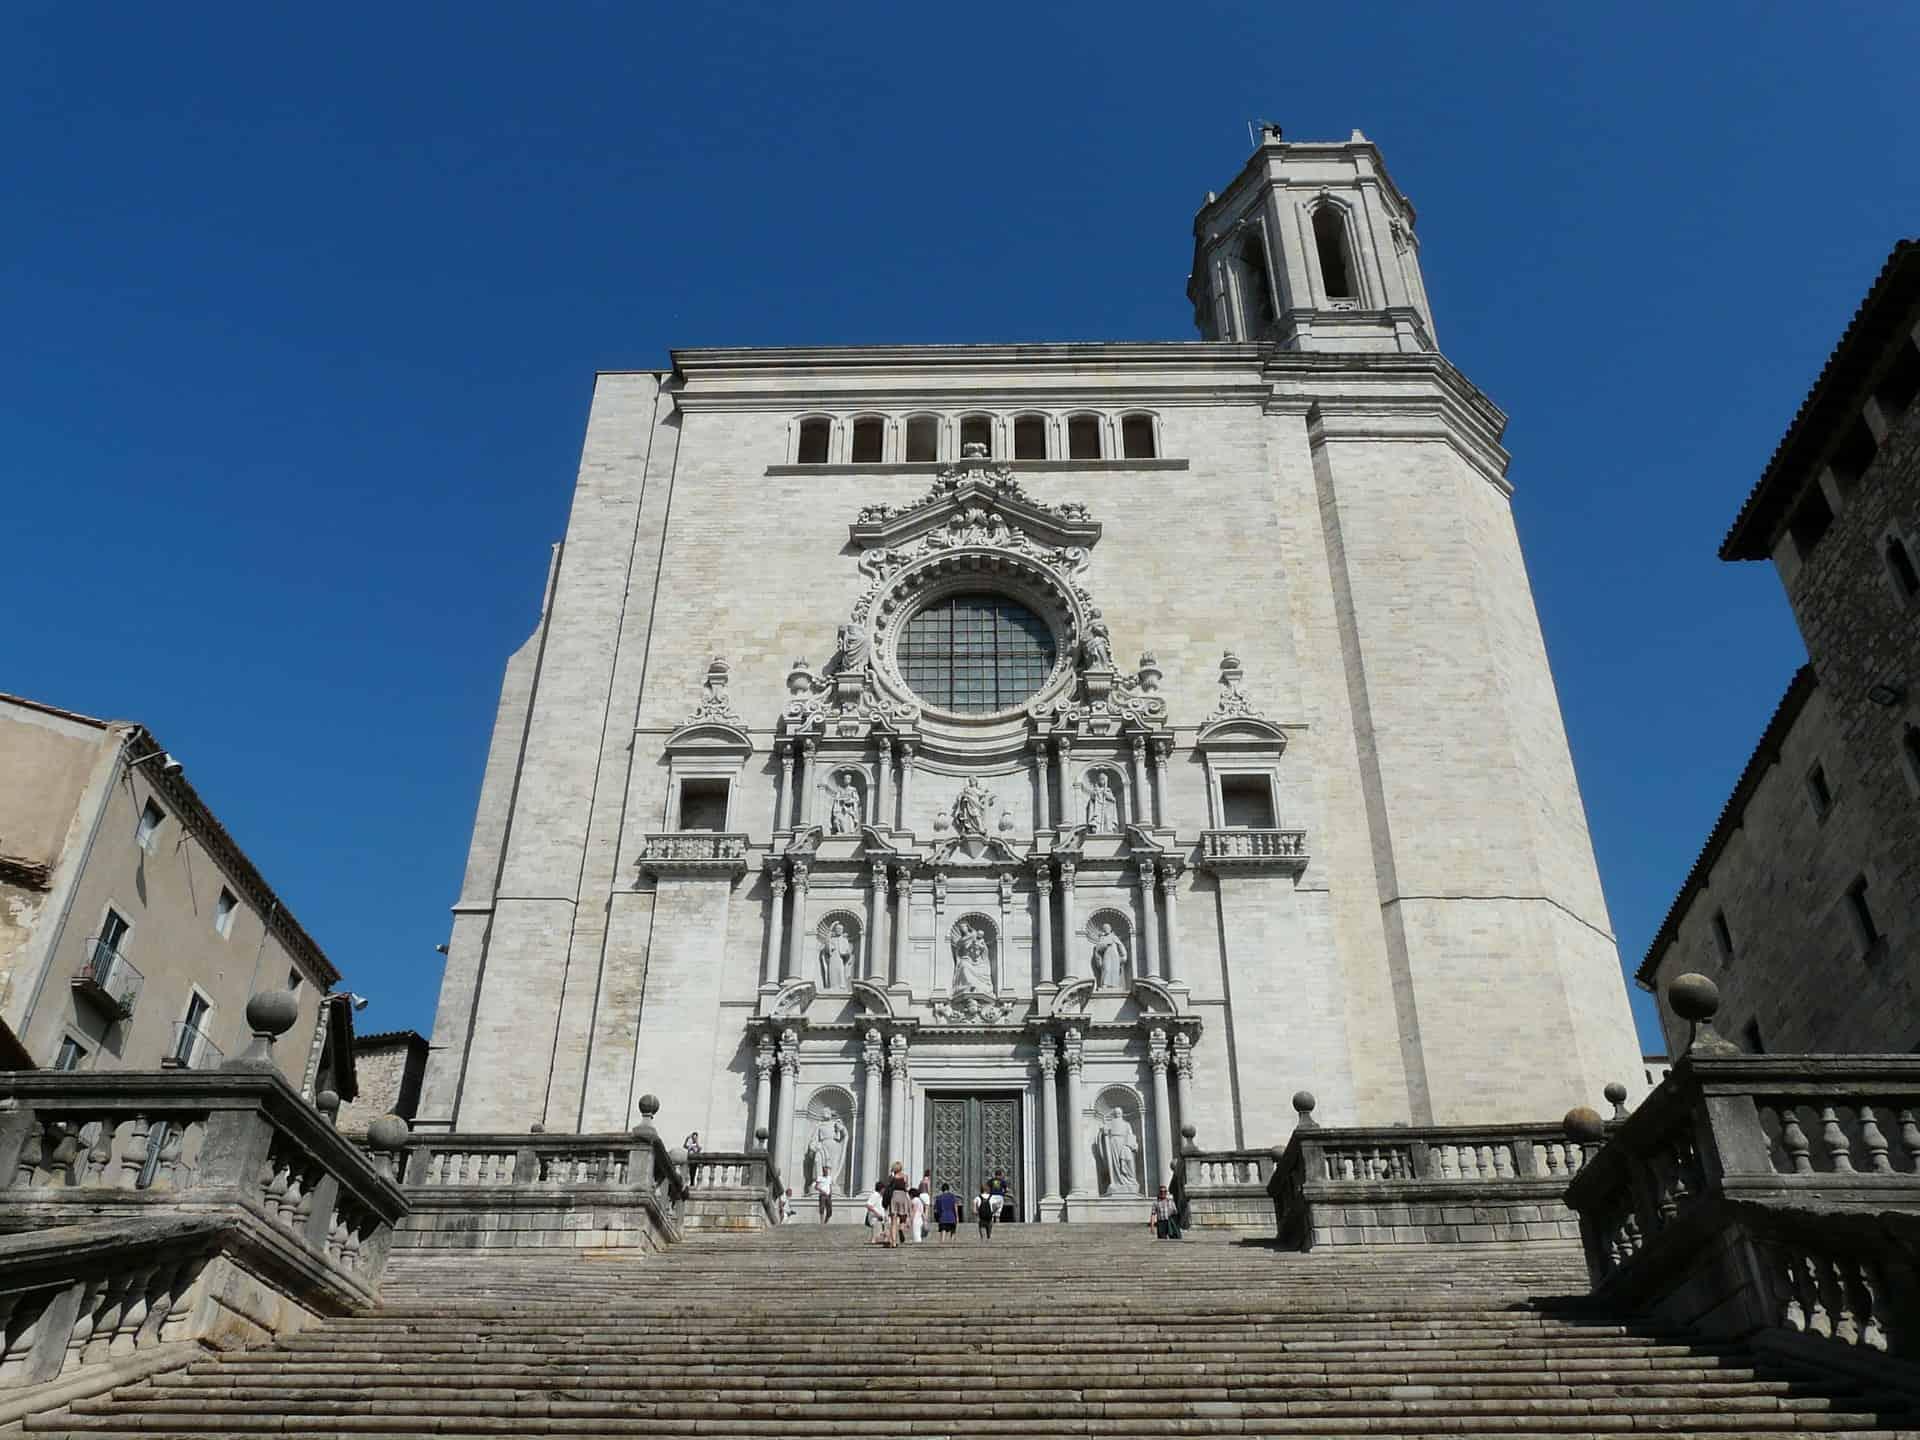 Girona's impressive cathedral